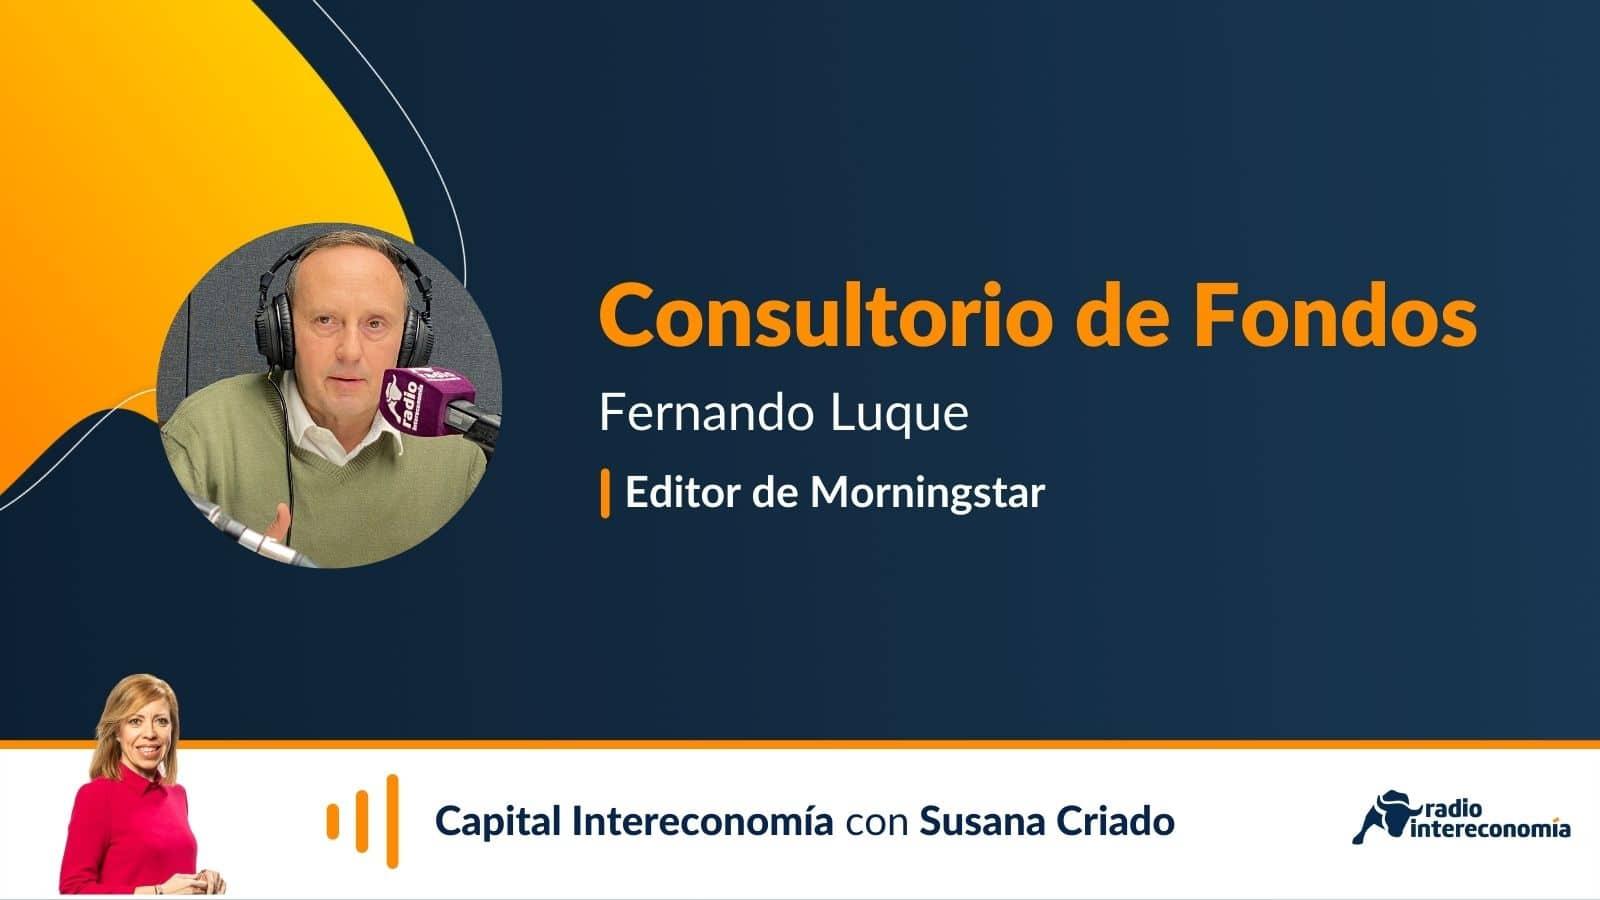 Consultorio de Fondos con Fernando Luque (Morningstar) 21/10/2021